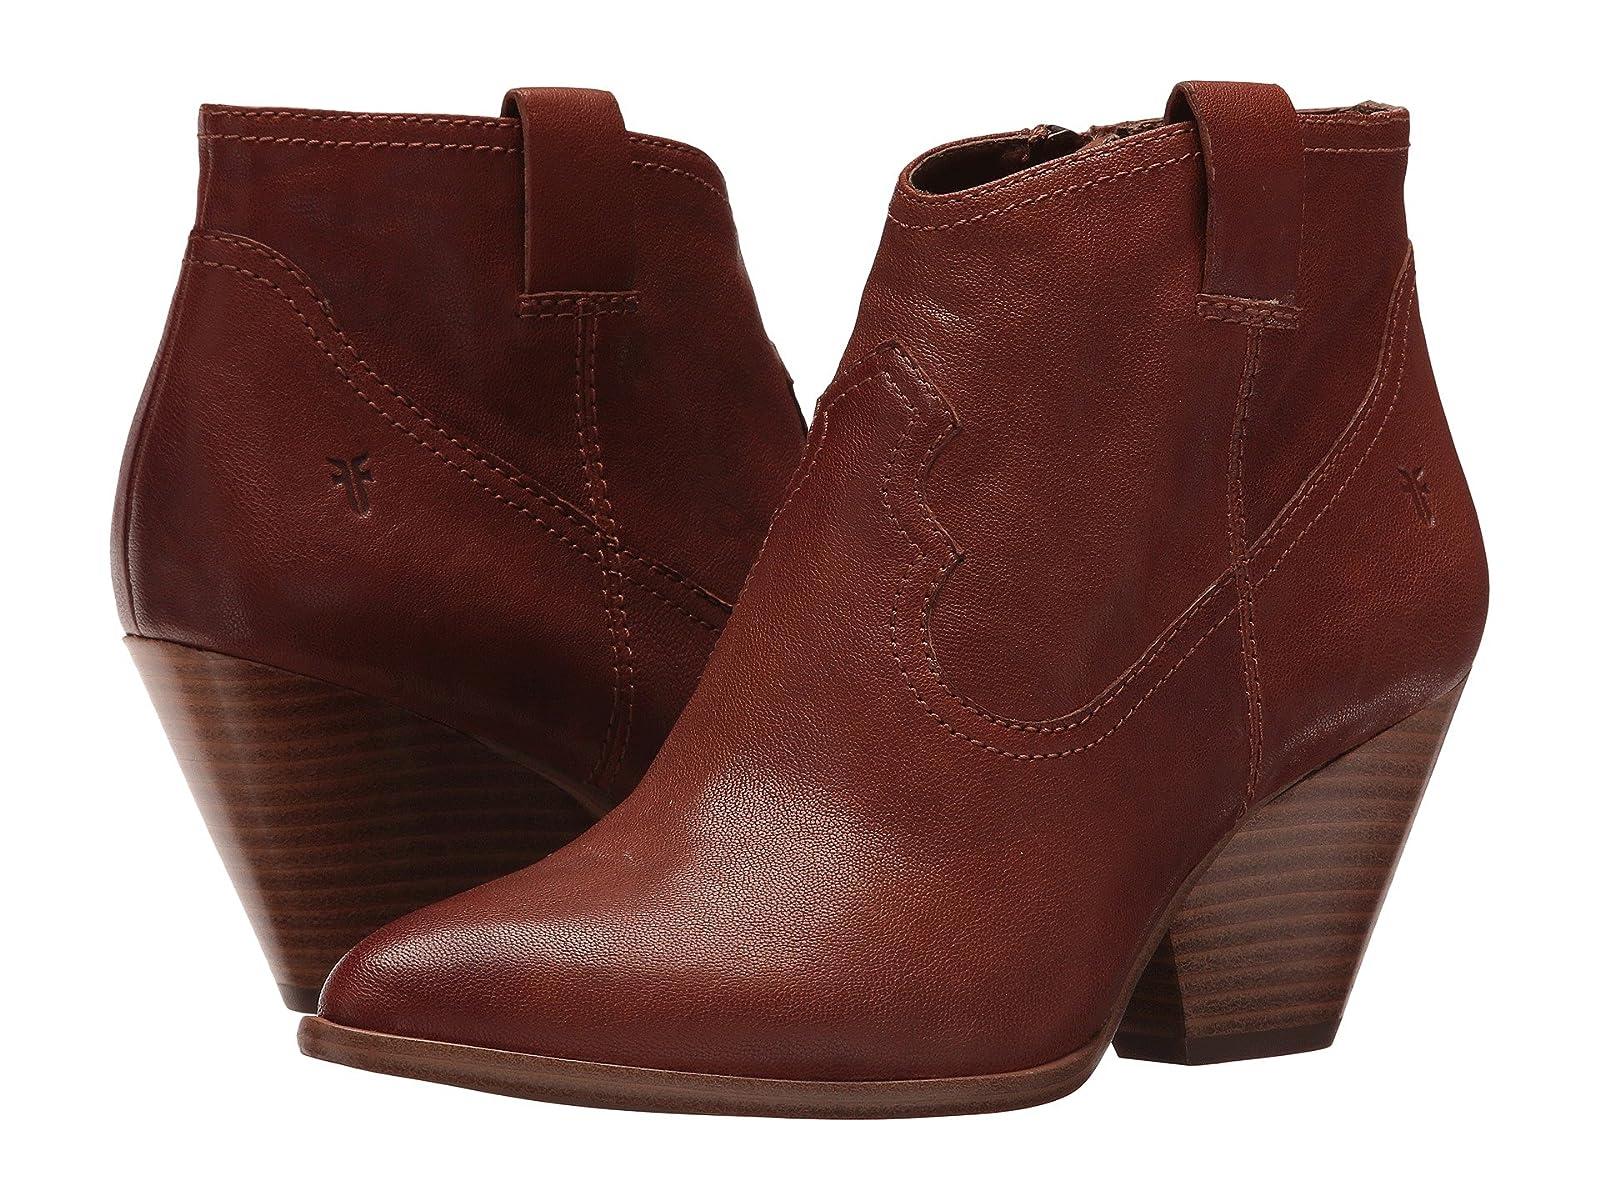 Frye Reina BootieCheap and distinctive eye-catching shoes